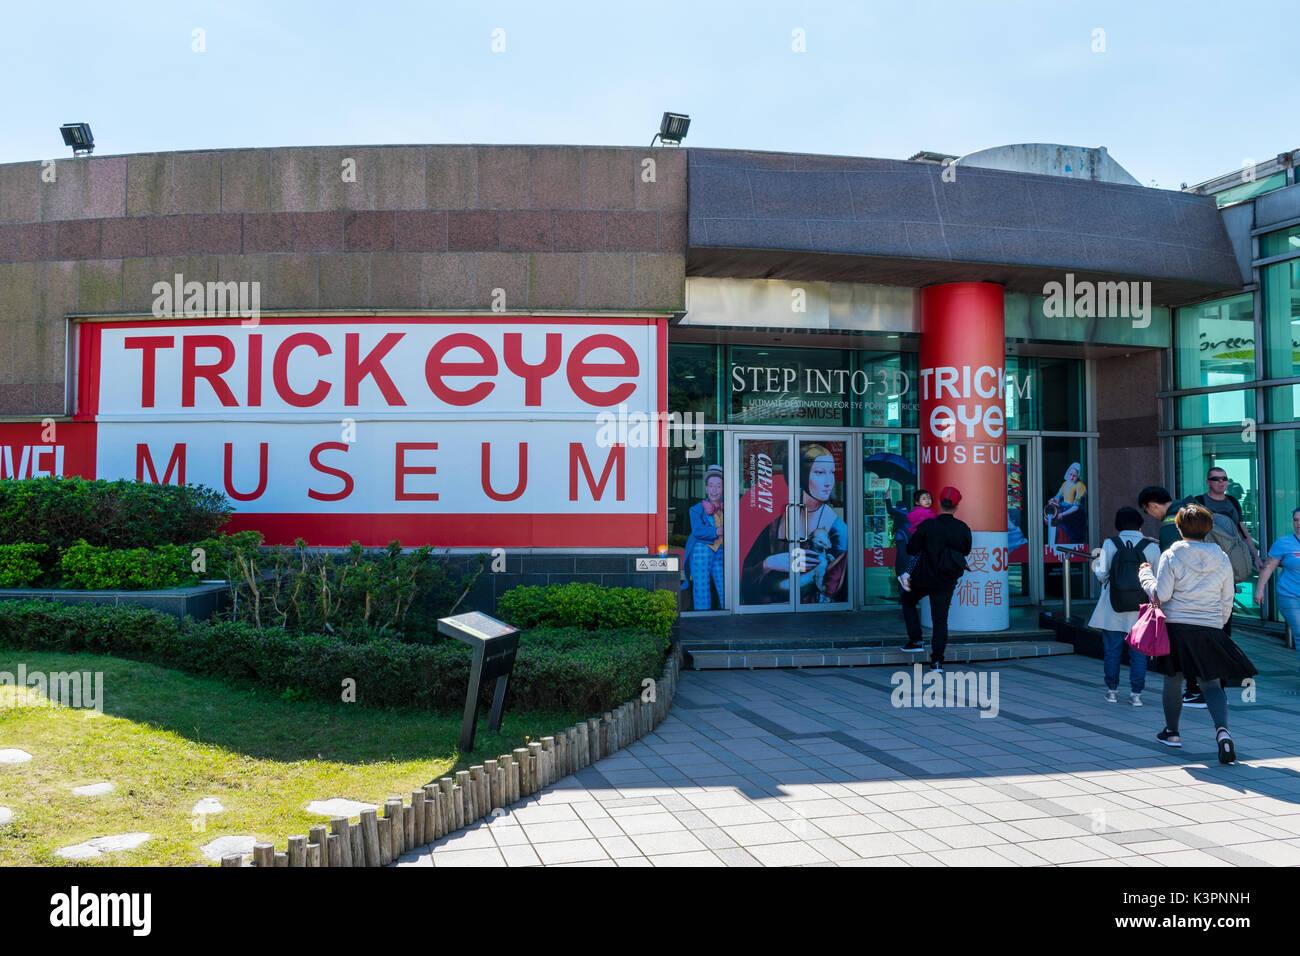 Trickeye Museum exterior in Hong Kong SAR - Stock Image